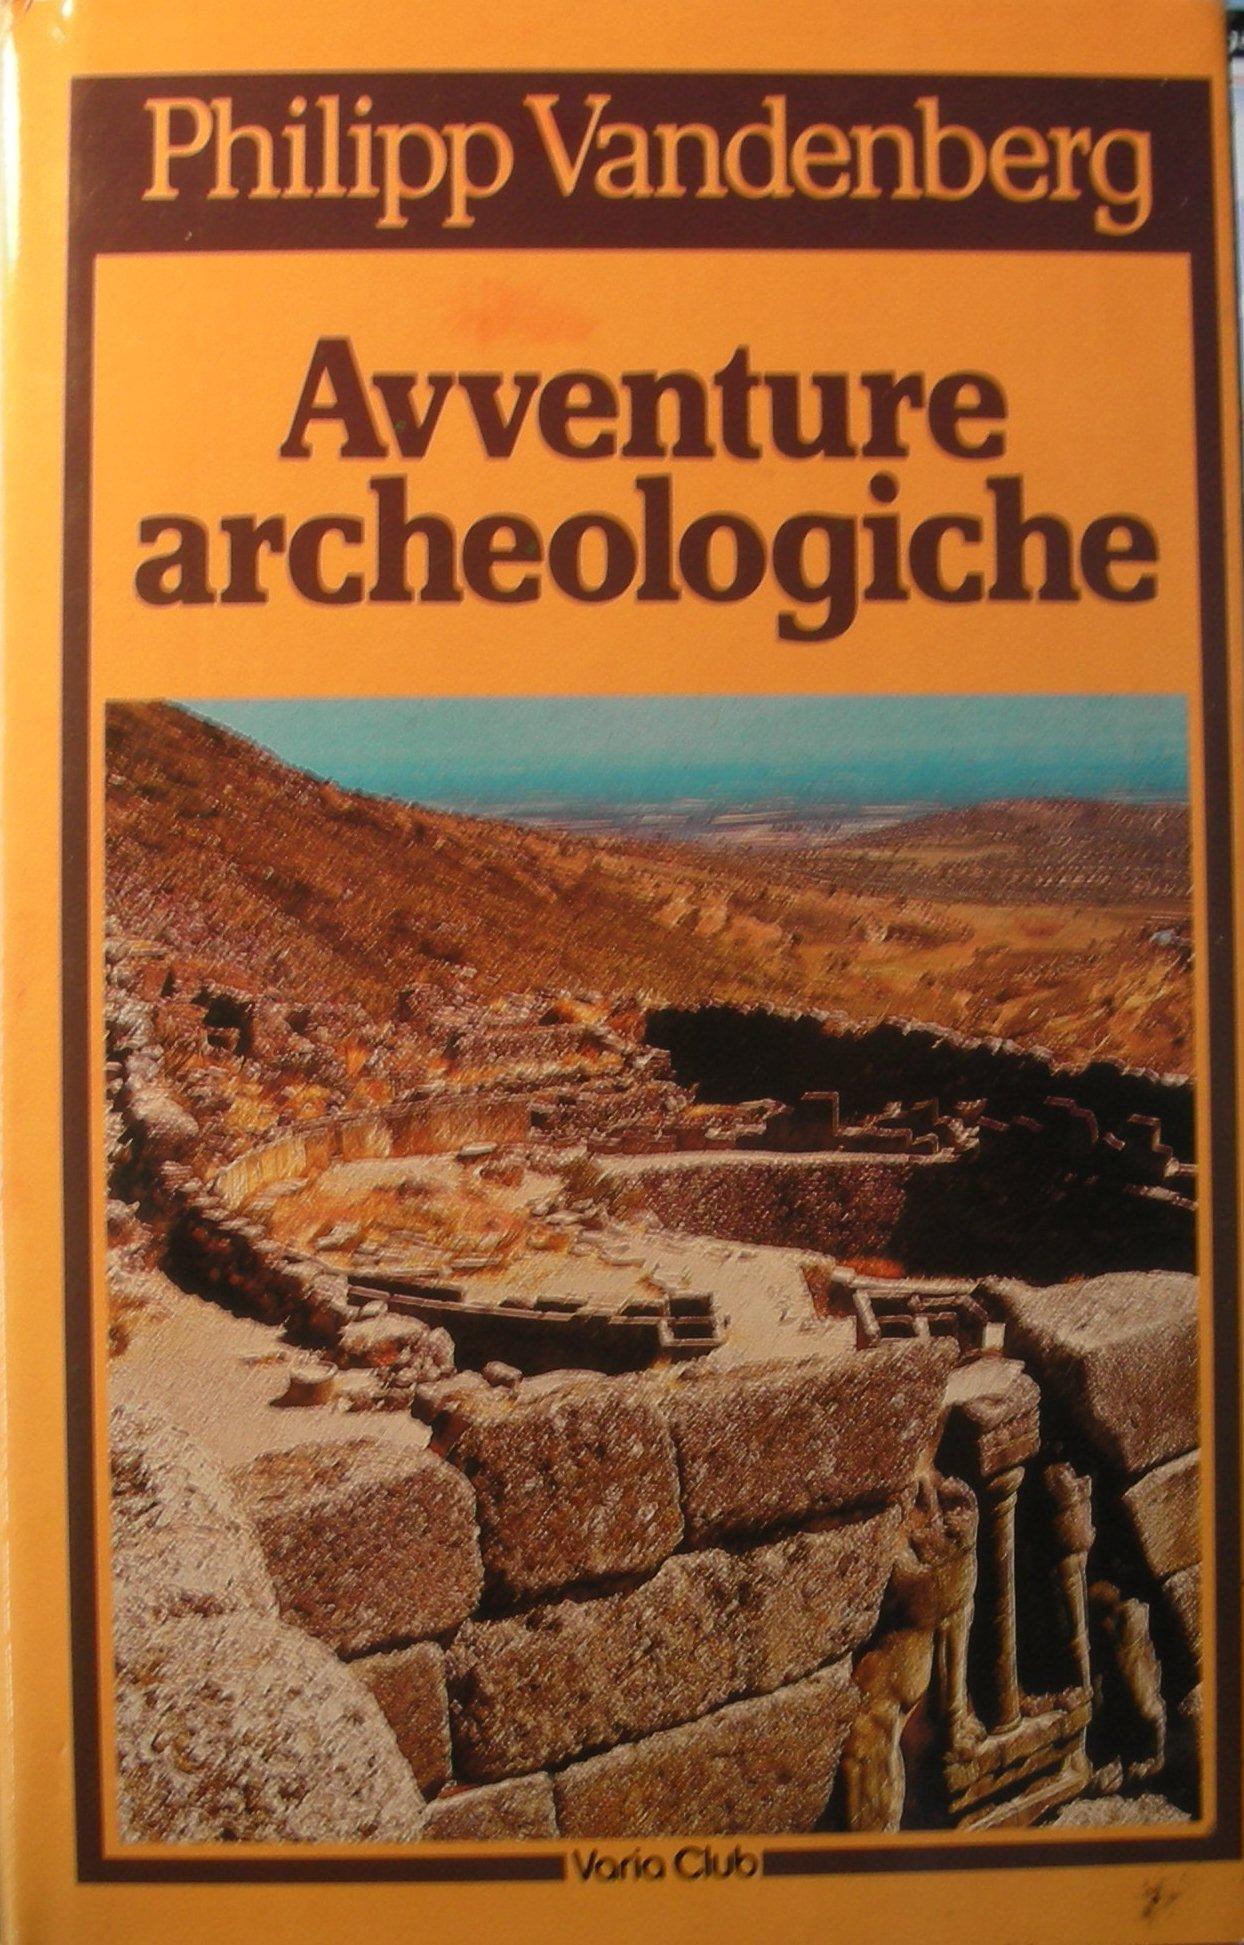 Avventure archeologiche